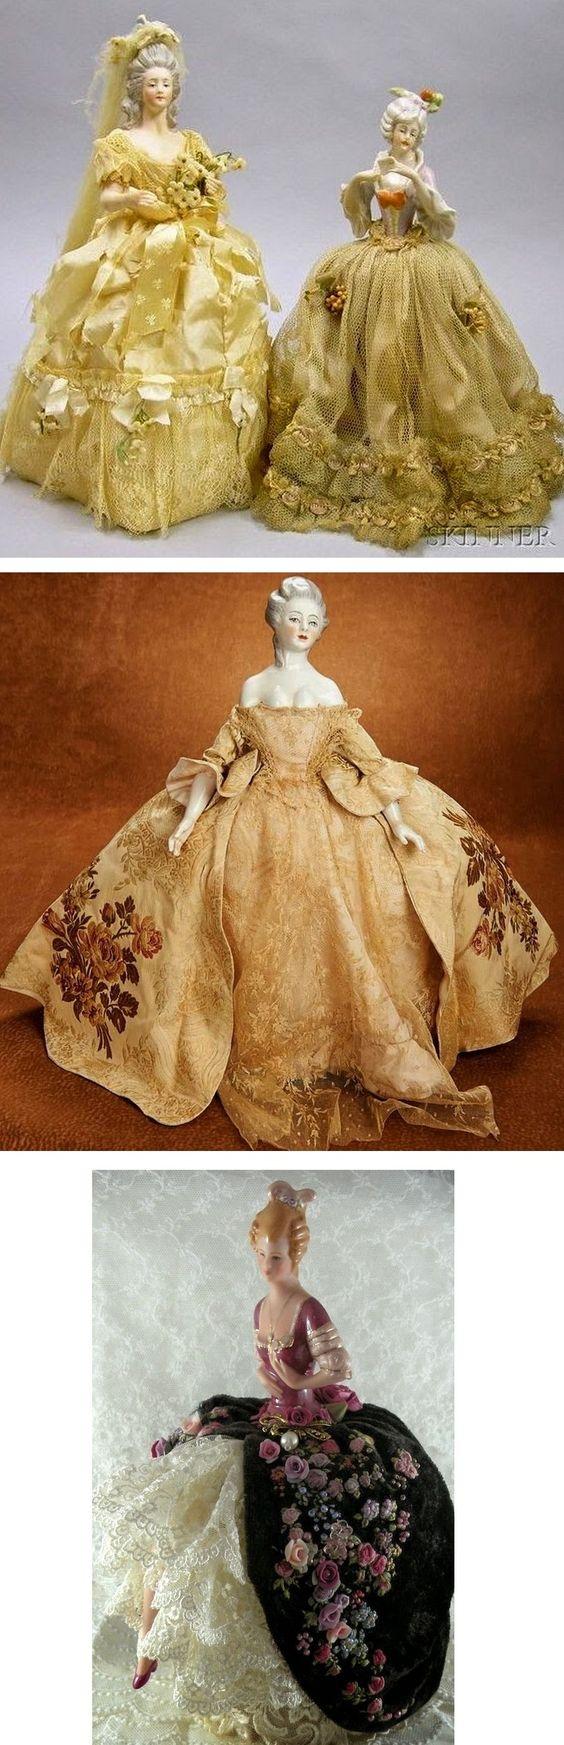 Idea for doll pincushion - love the pretty gowns! :)